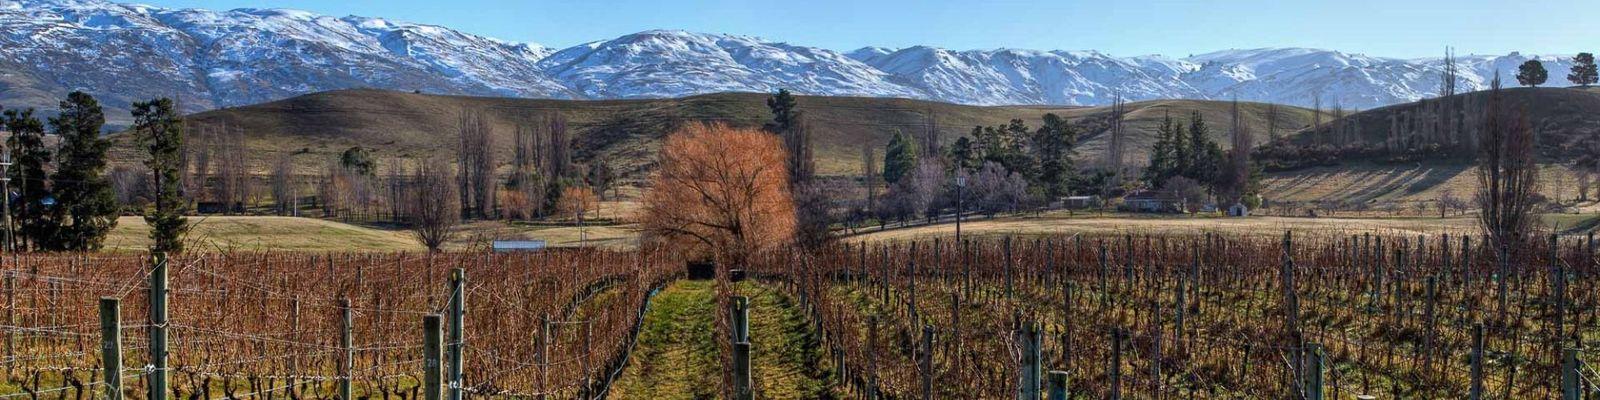 Central Otago Wine Regions